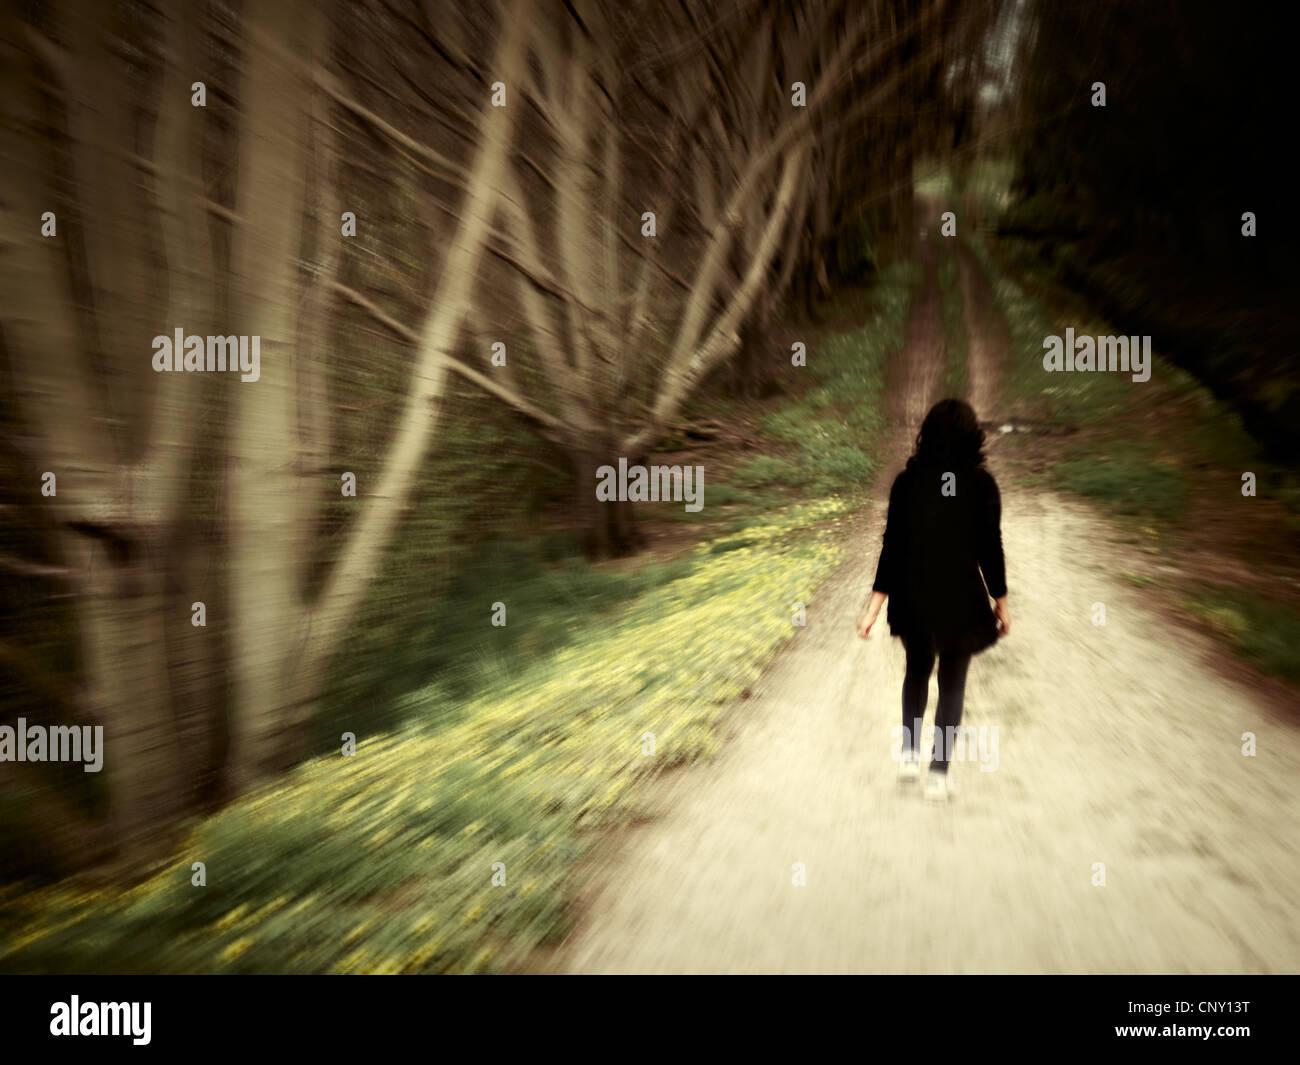 Frau geht auf Wald Weg. Stockbild